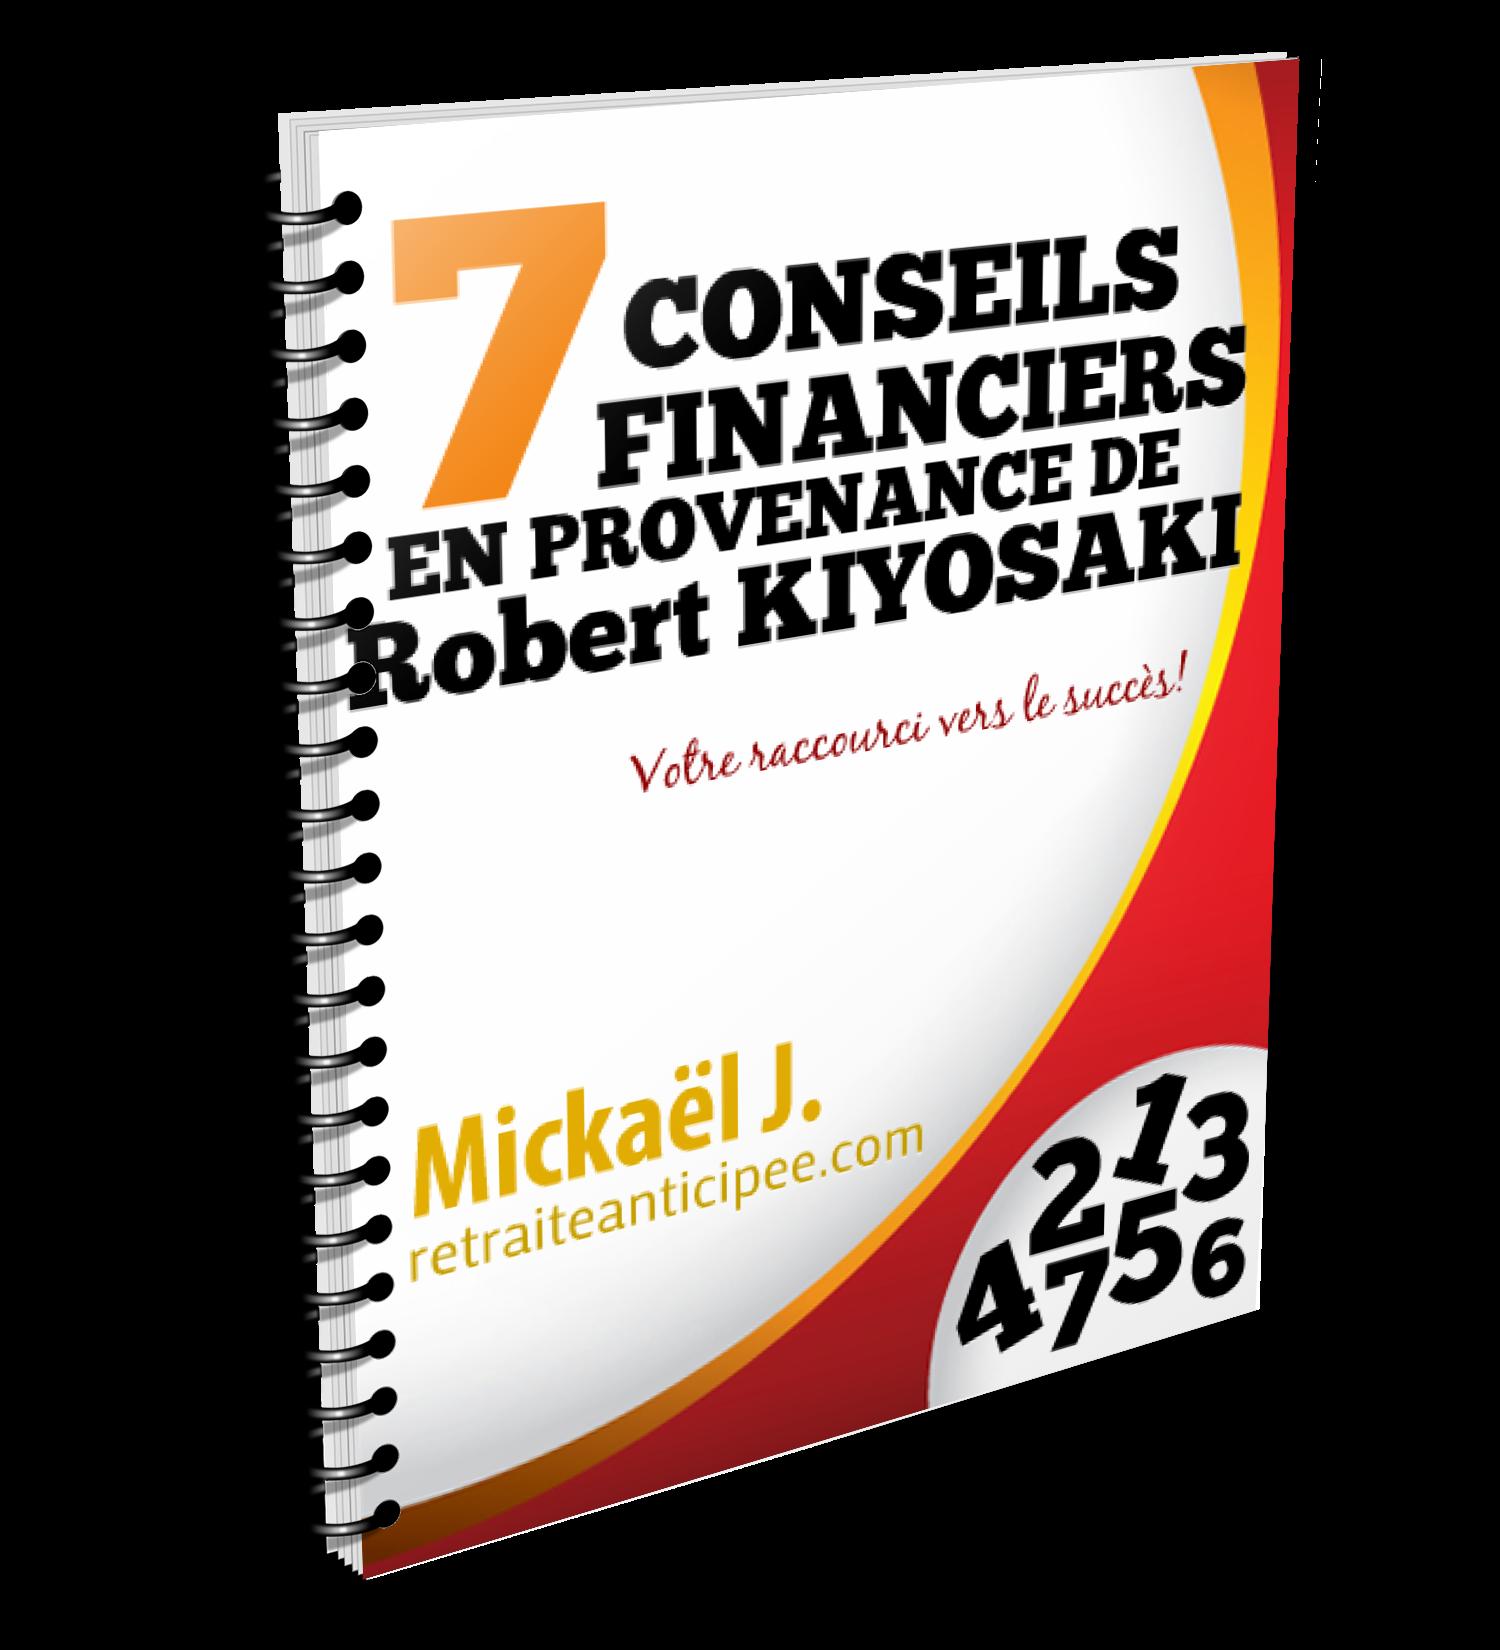 7 conseils de Robert Kiyosaki pour atteindre son plein potentiel